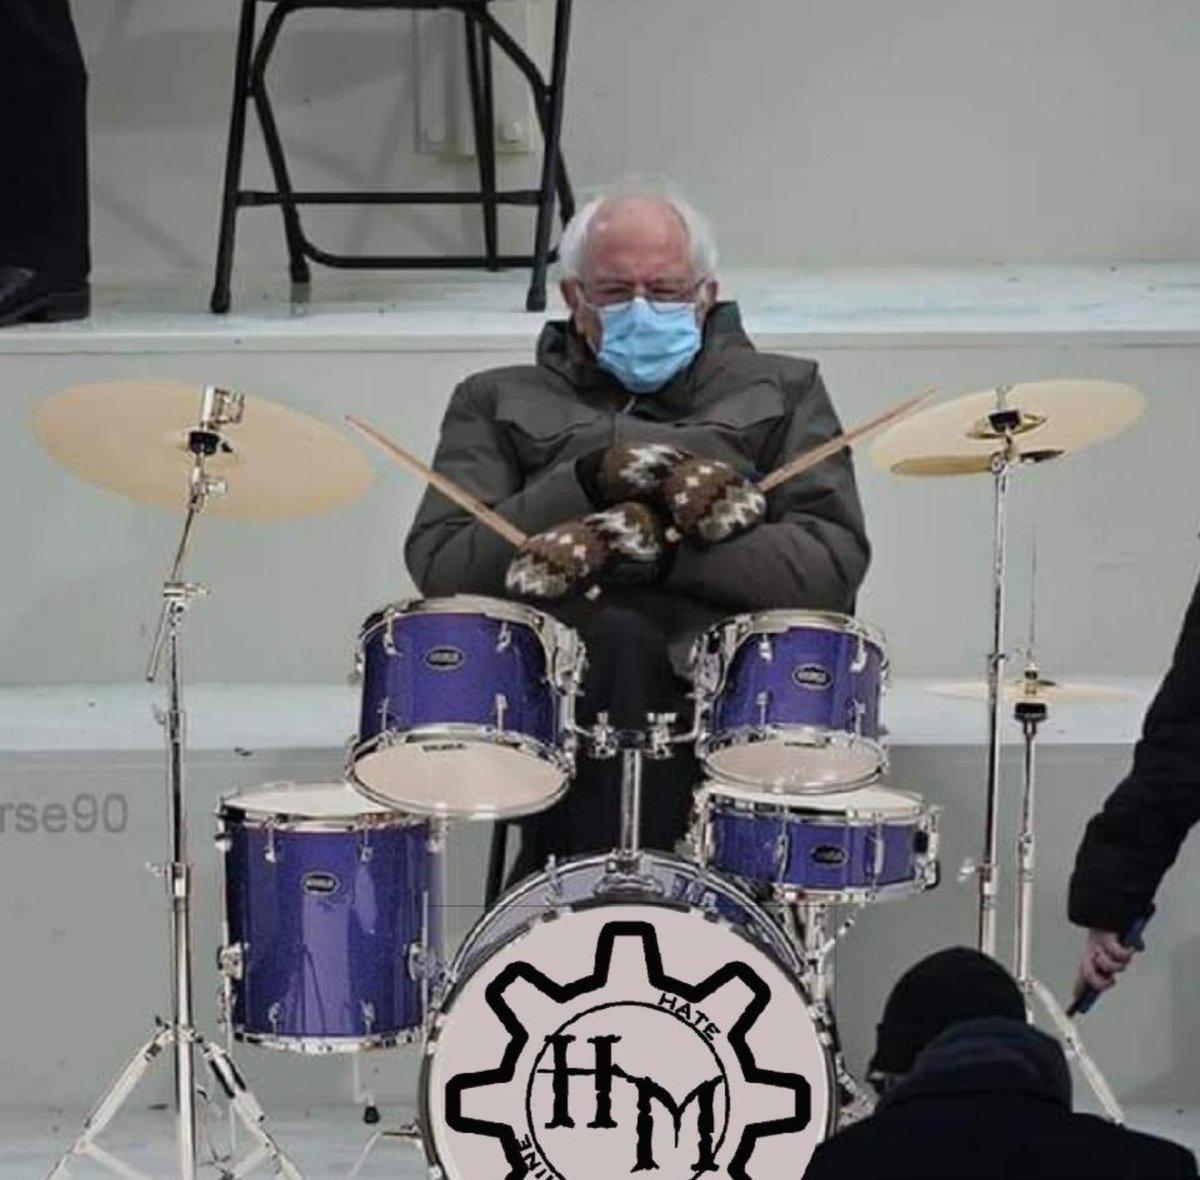 Unfortunately I have to step down as the drummer. Dave has found a replacement.  -Chad #wednesdaythought #BernieSanders #berniesandersmeme @SenSanders #Metal #MetalMusic #drummer